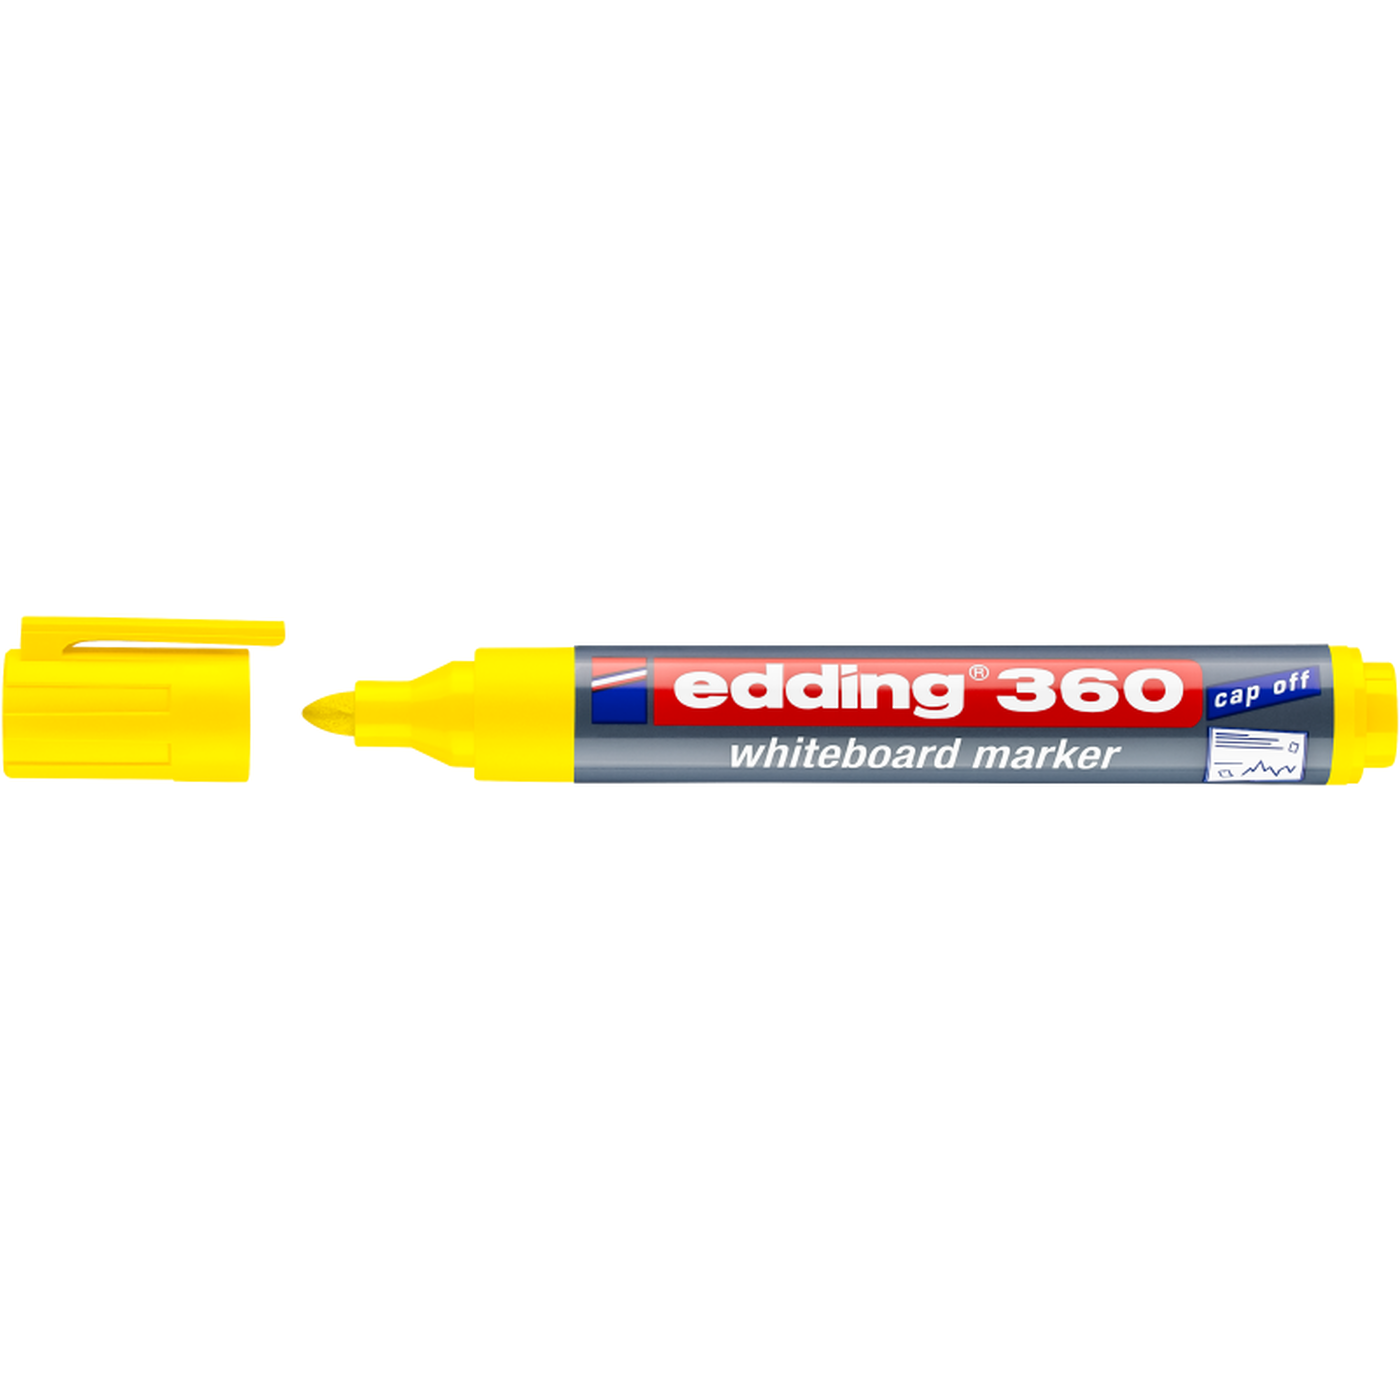 EDDING 360 WHITEBOARD MARKER (YELLOW)